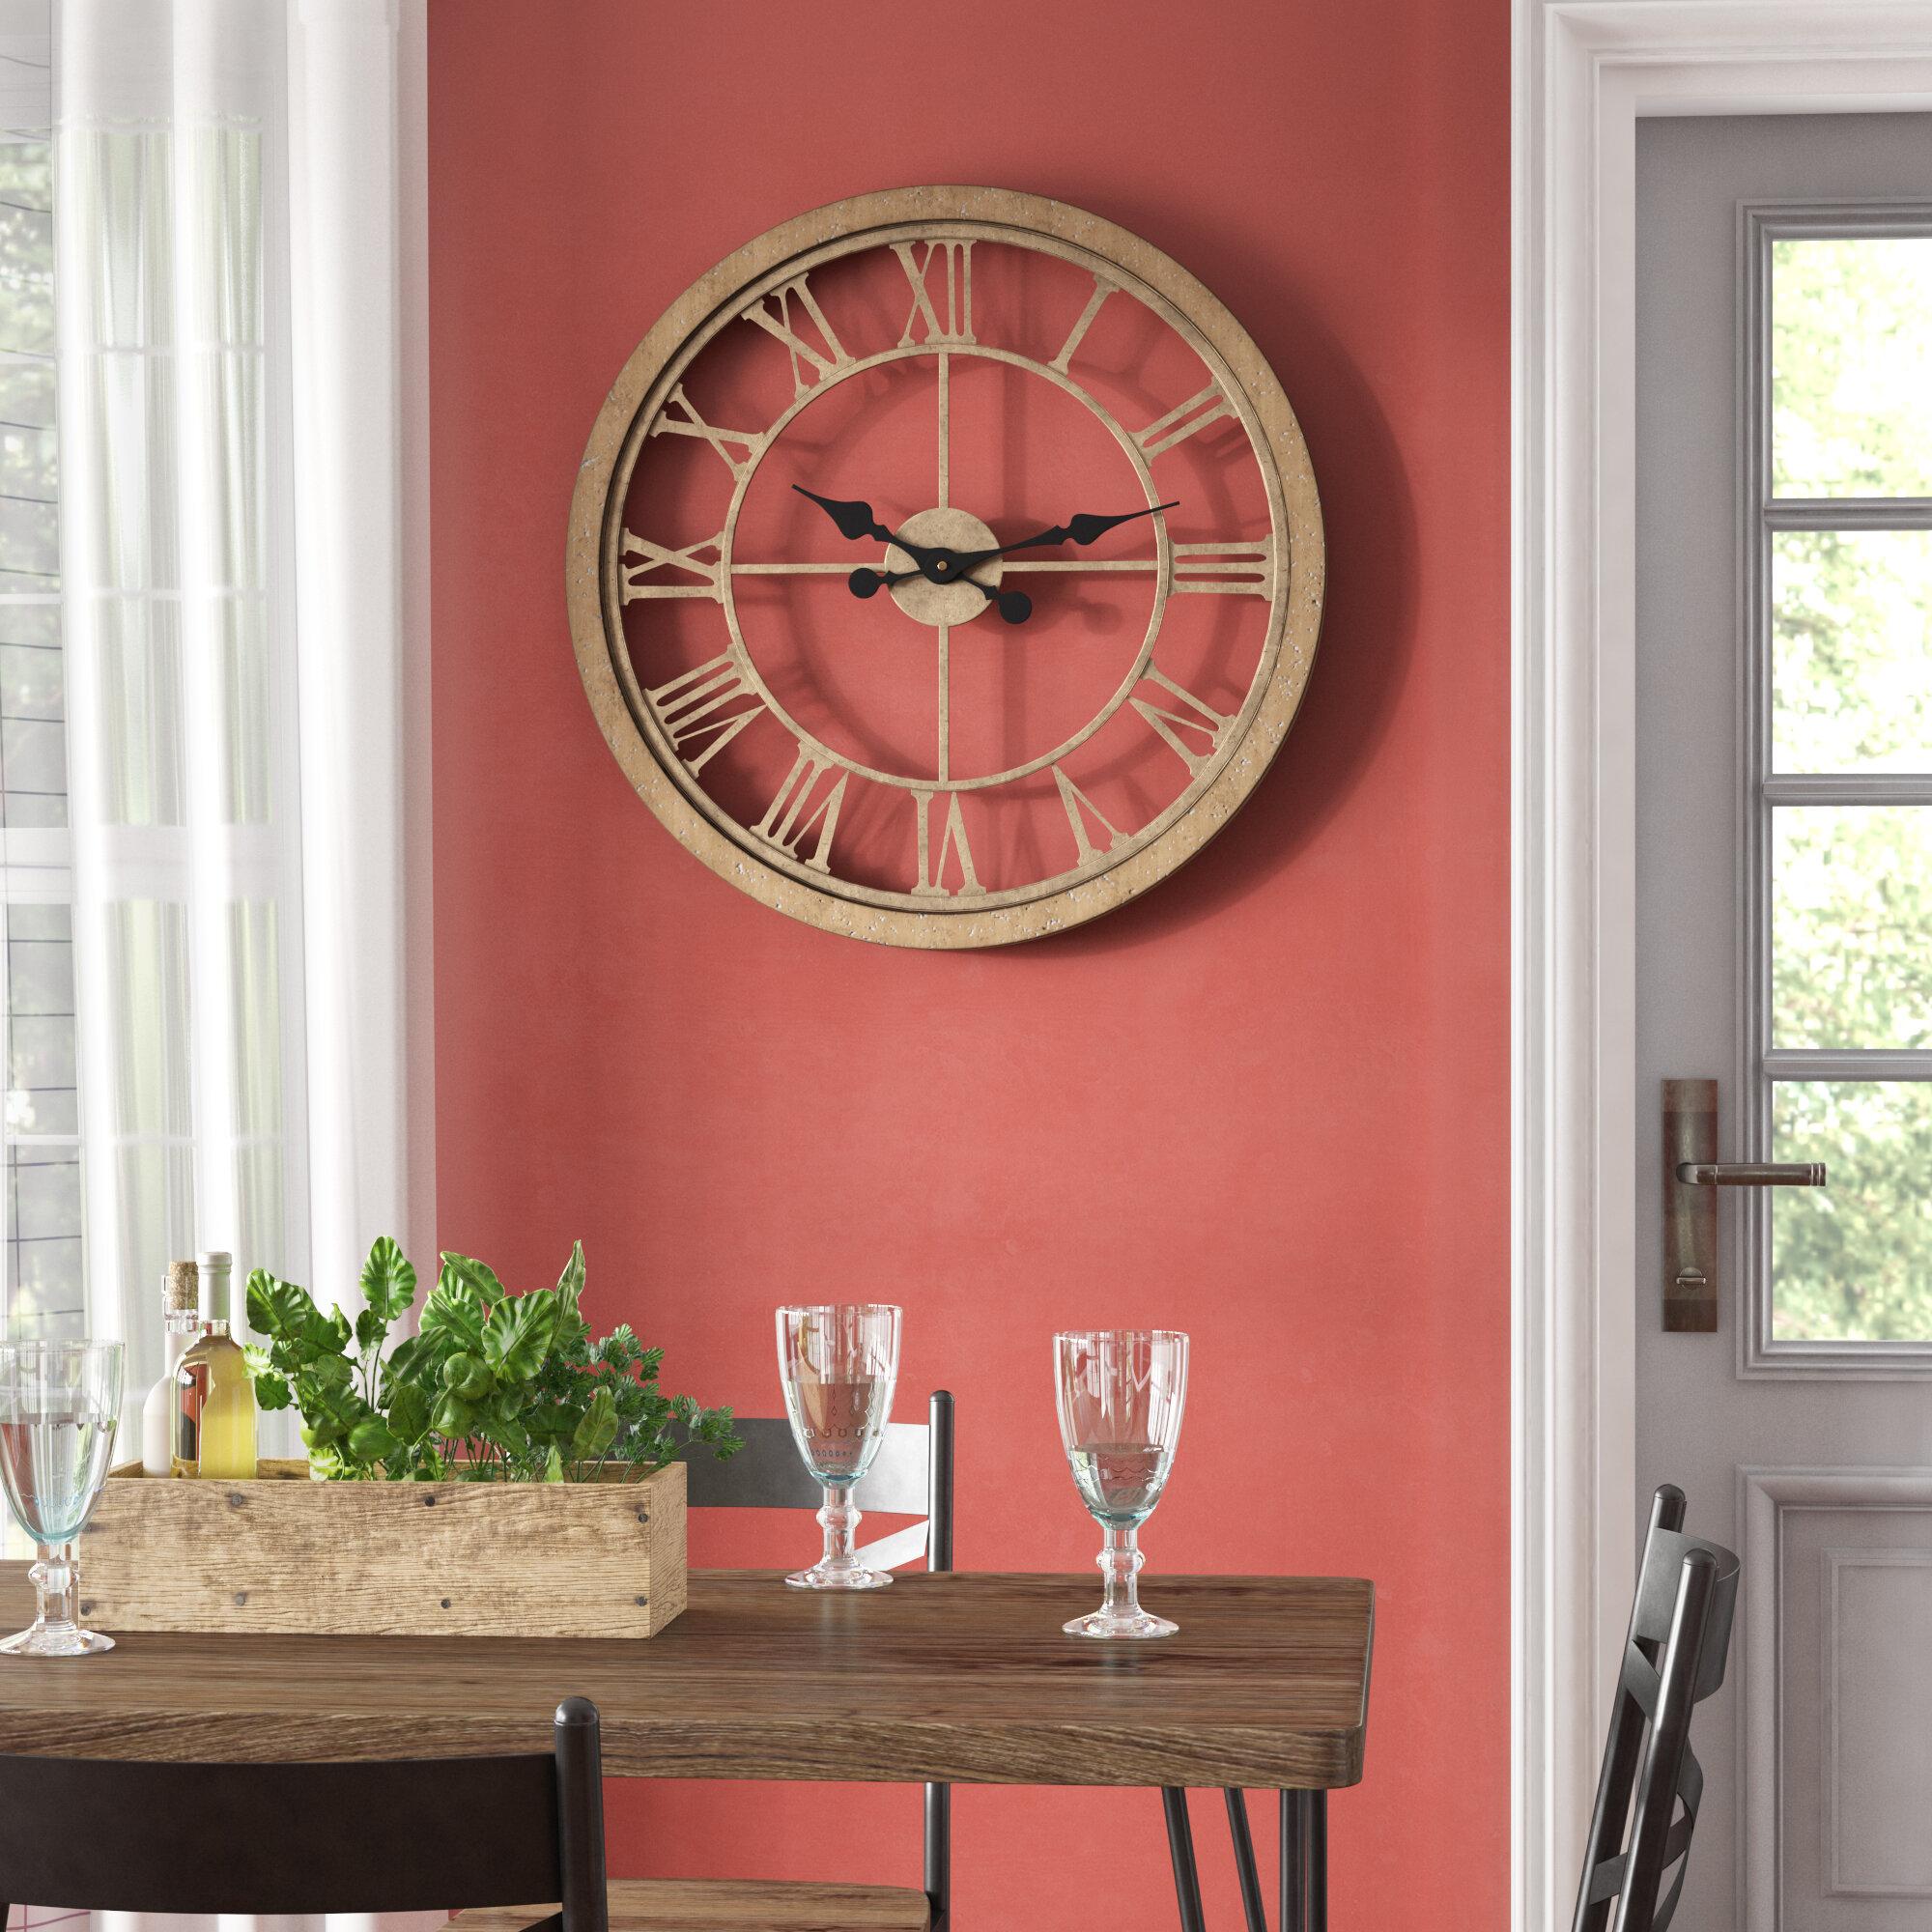 Farmhouse & Rustic Wall Clocks | Birch Lane